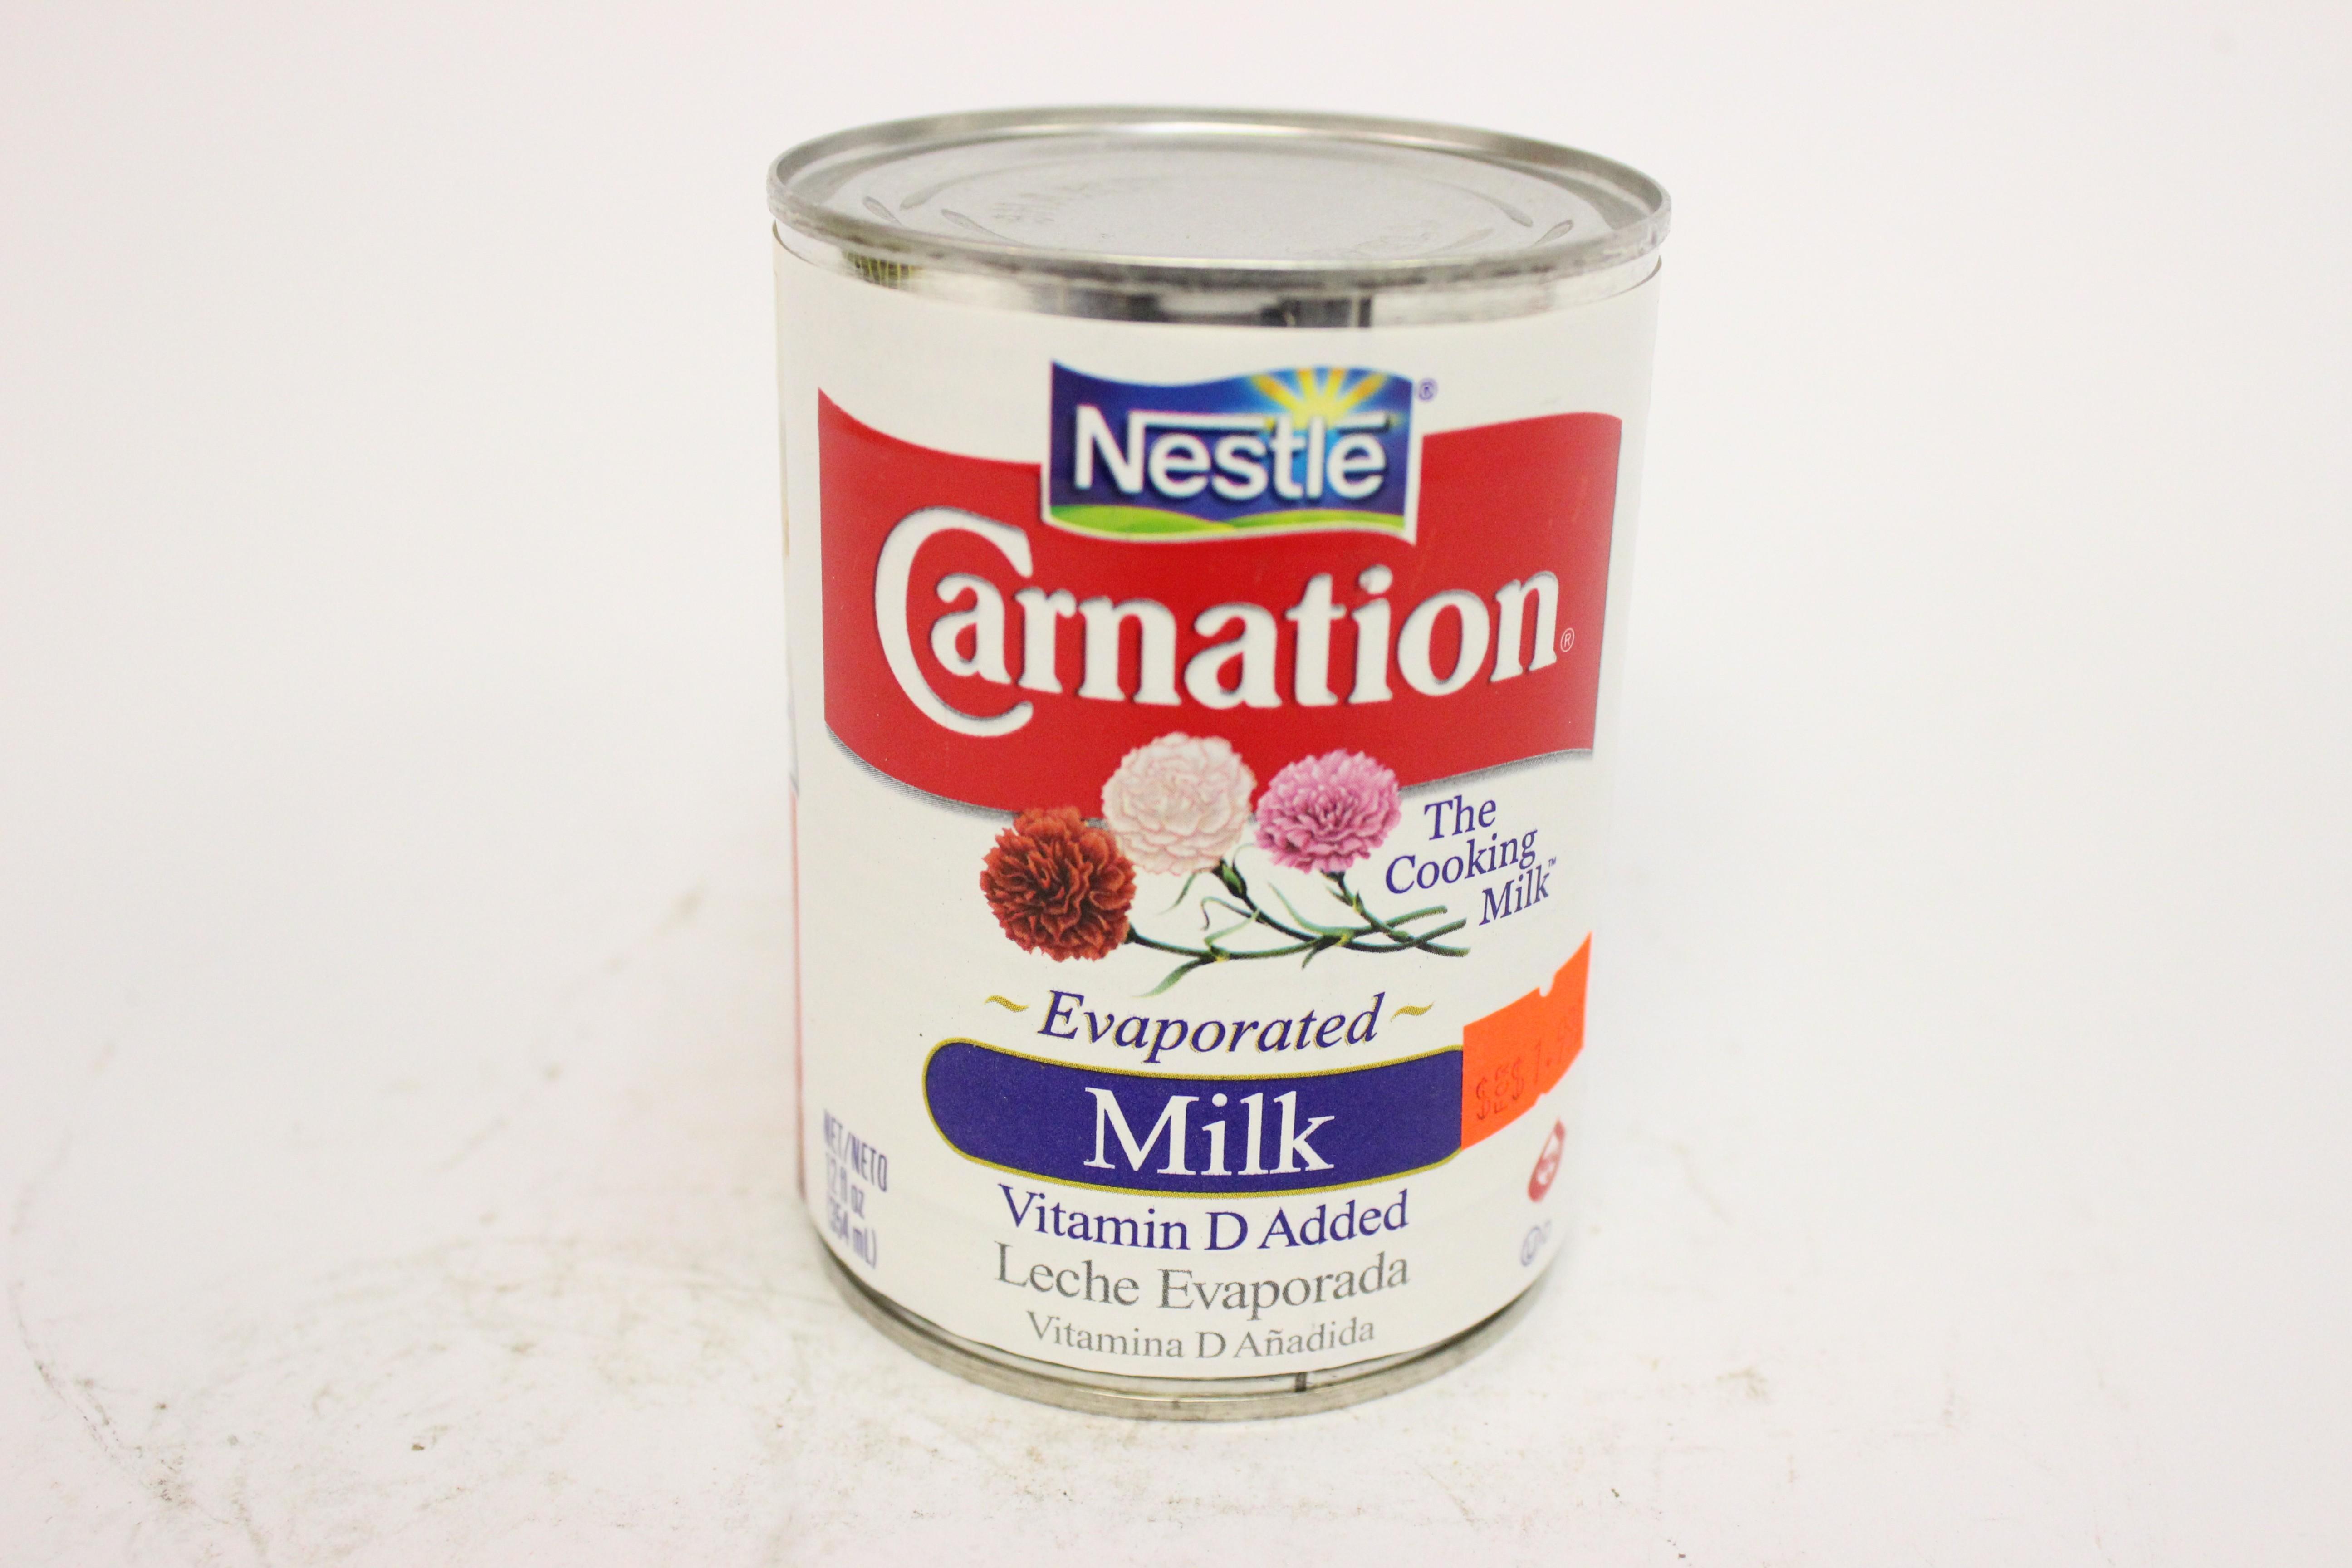 Carnation Evaporated Milk 12 oz